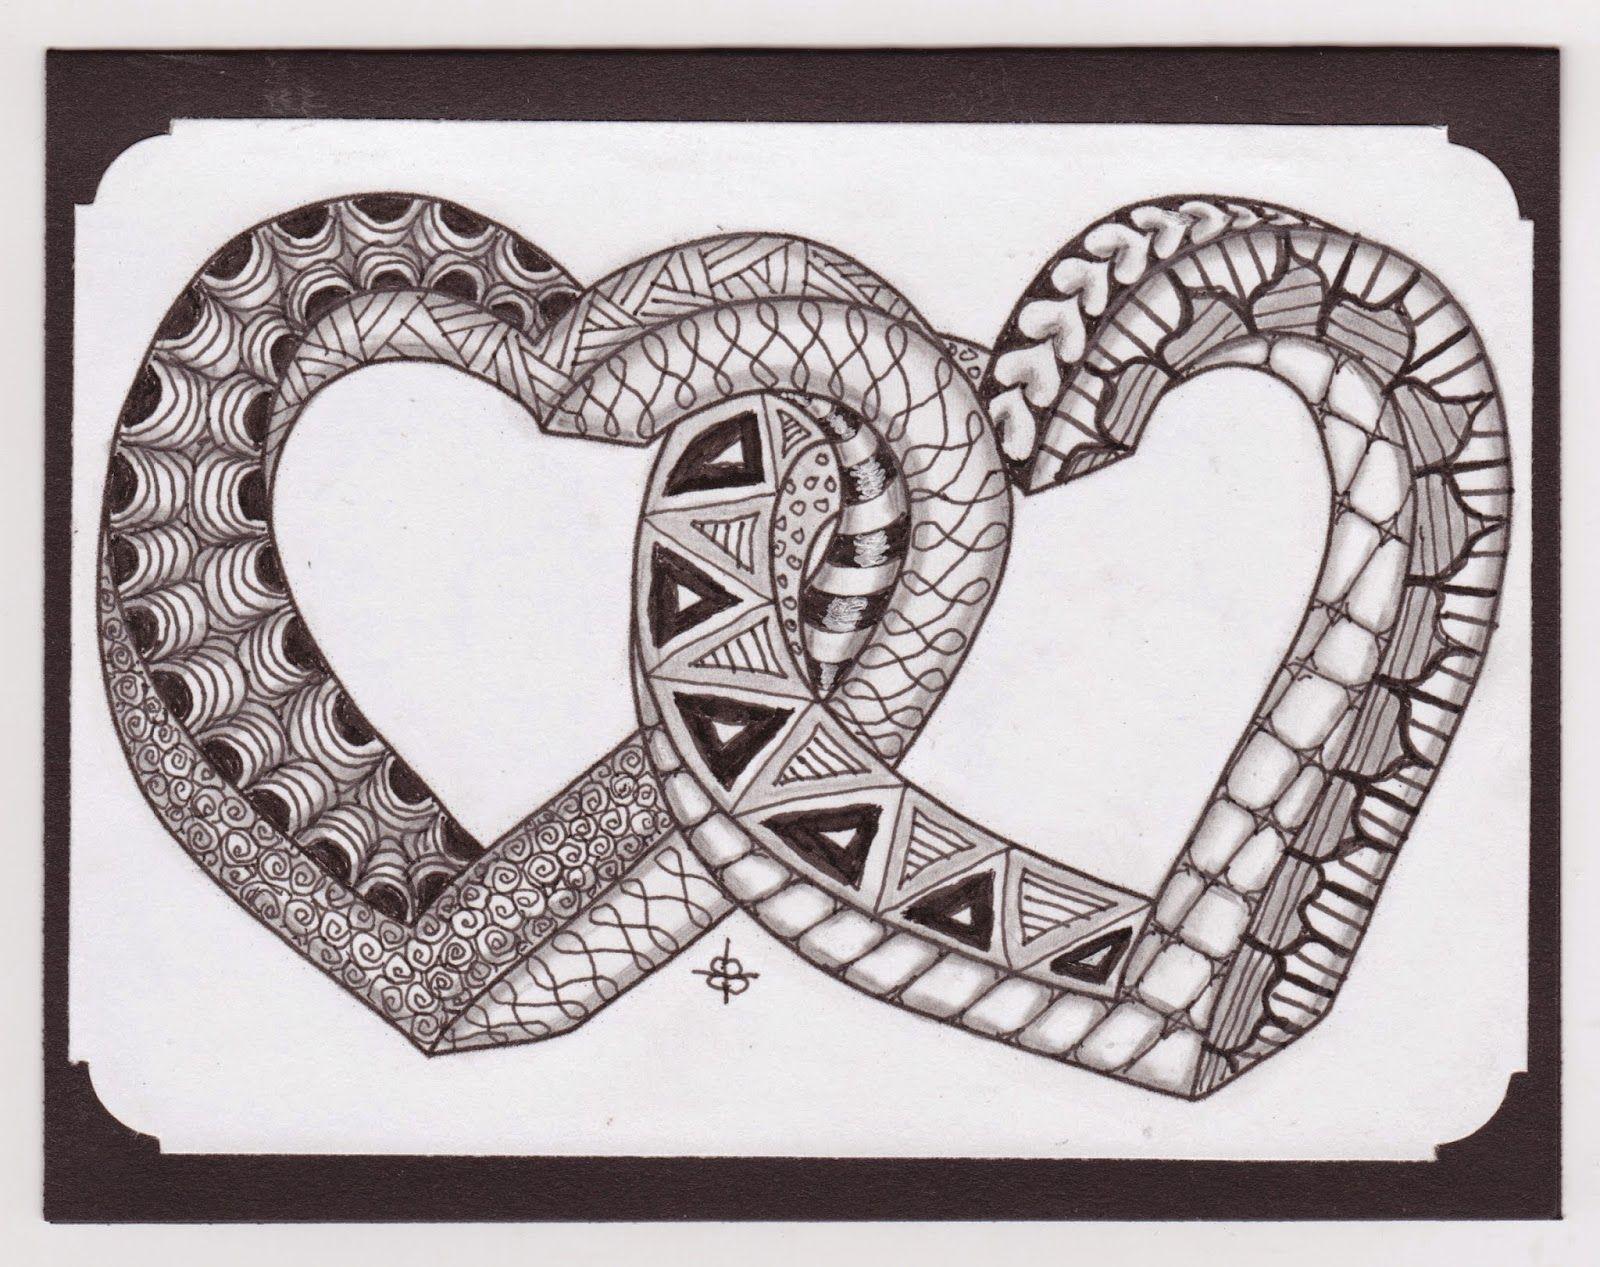 Impossible Hearts Zentangle Zentangle Patterns Zentangle Drawings Zentangle